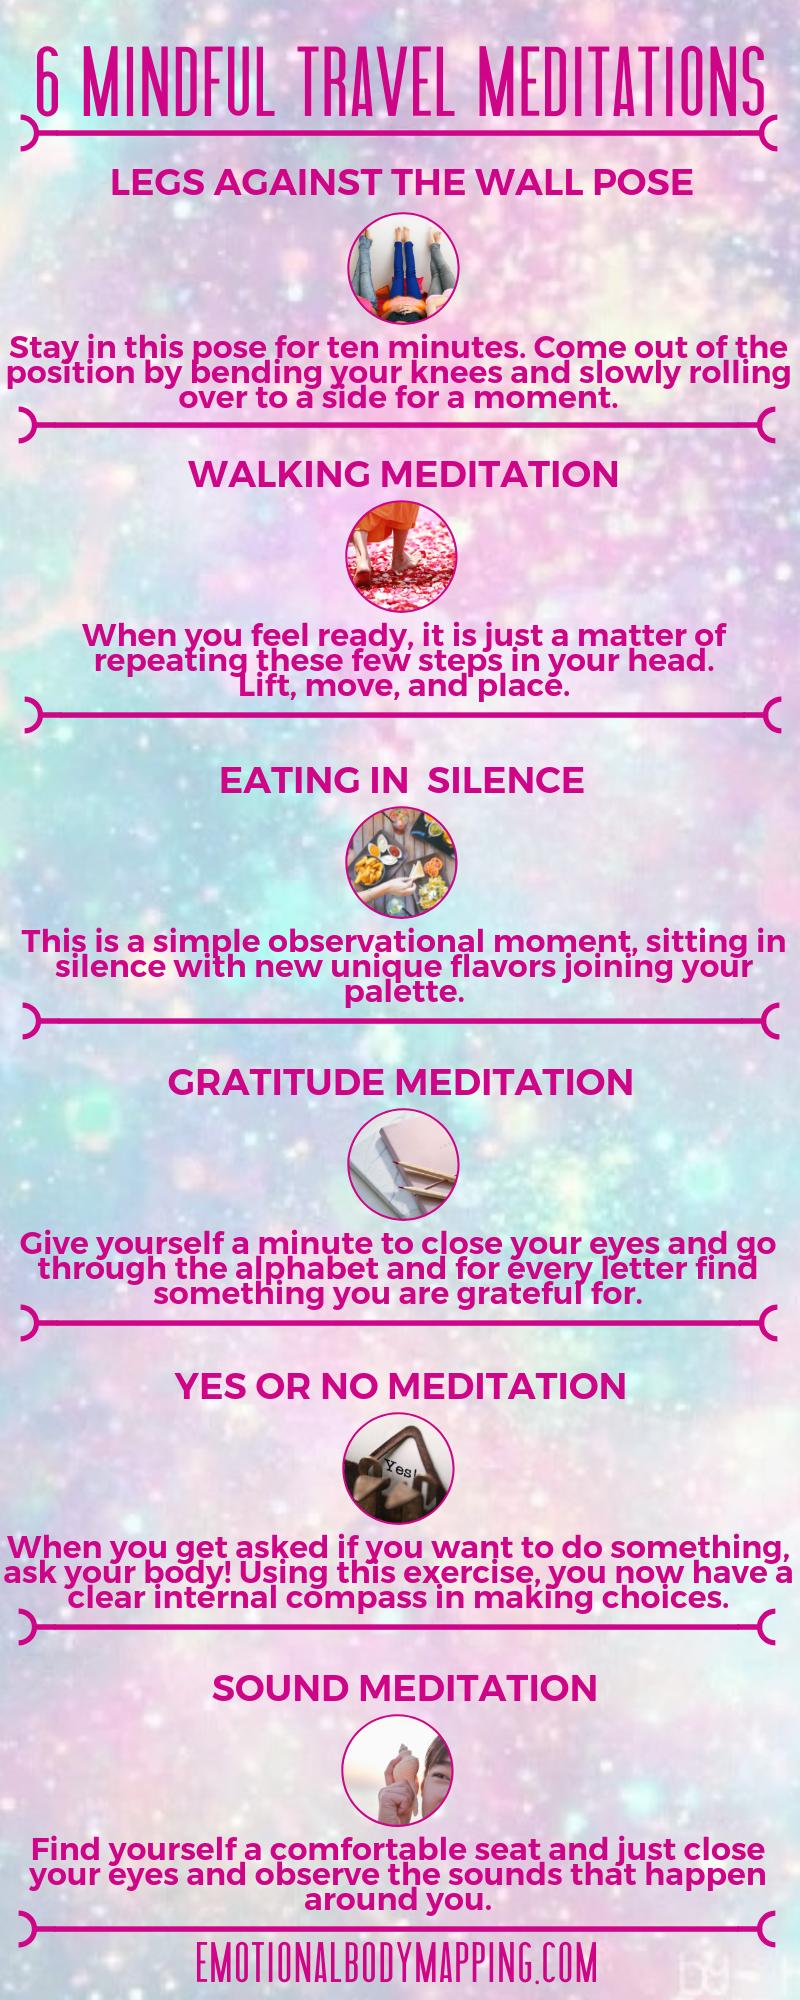 Travel Meditations